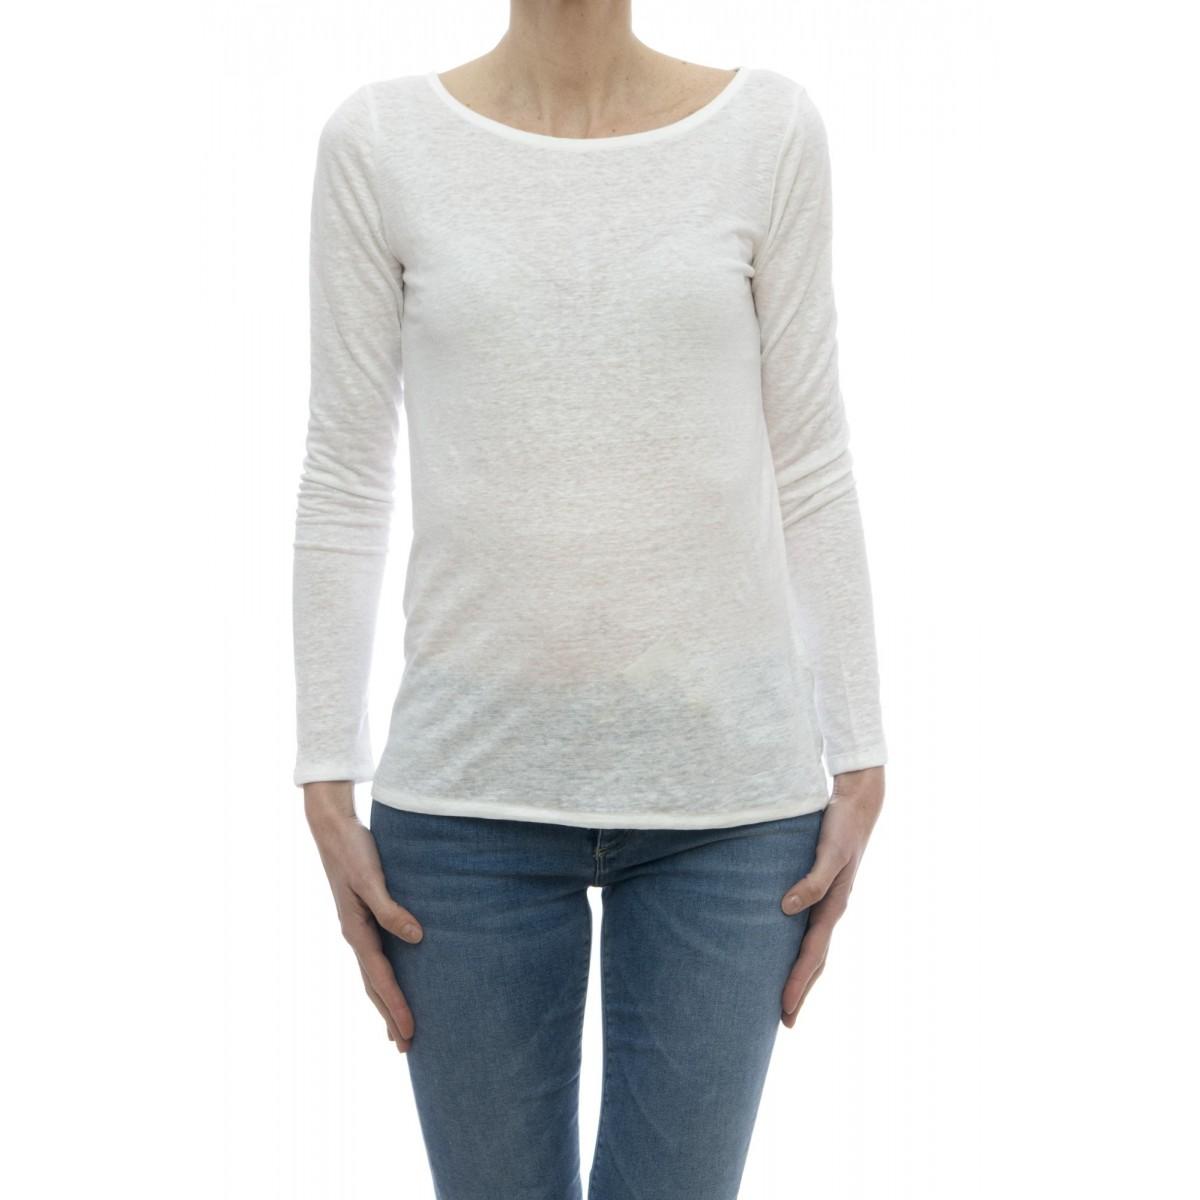 T-shirt - E16 13 lino elastane